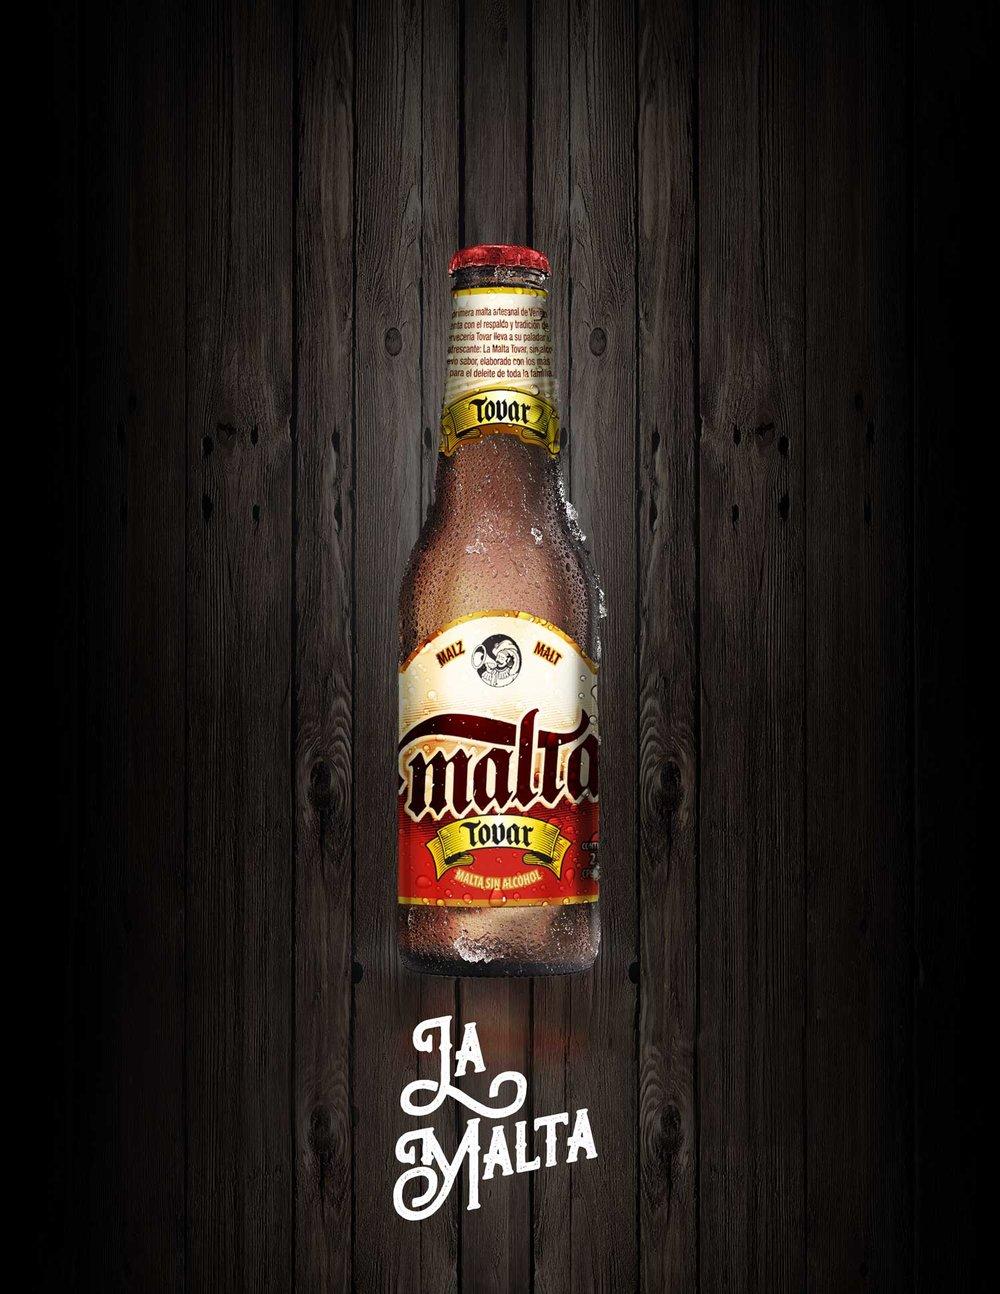 botellas-solas-fondo-madera-malta.jpg